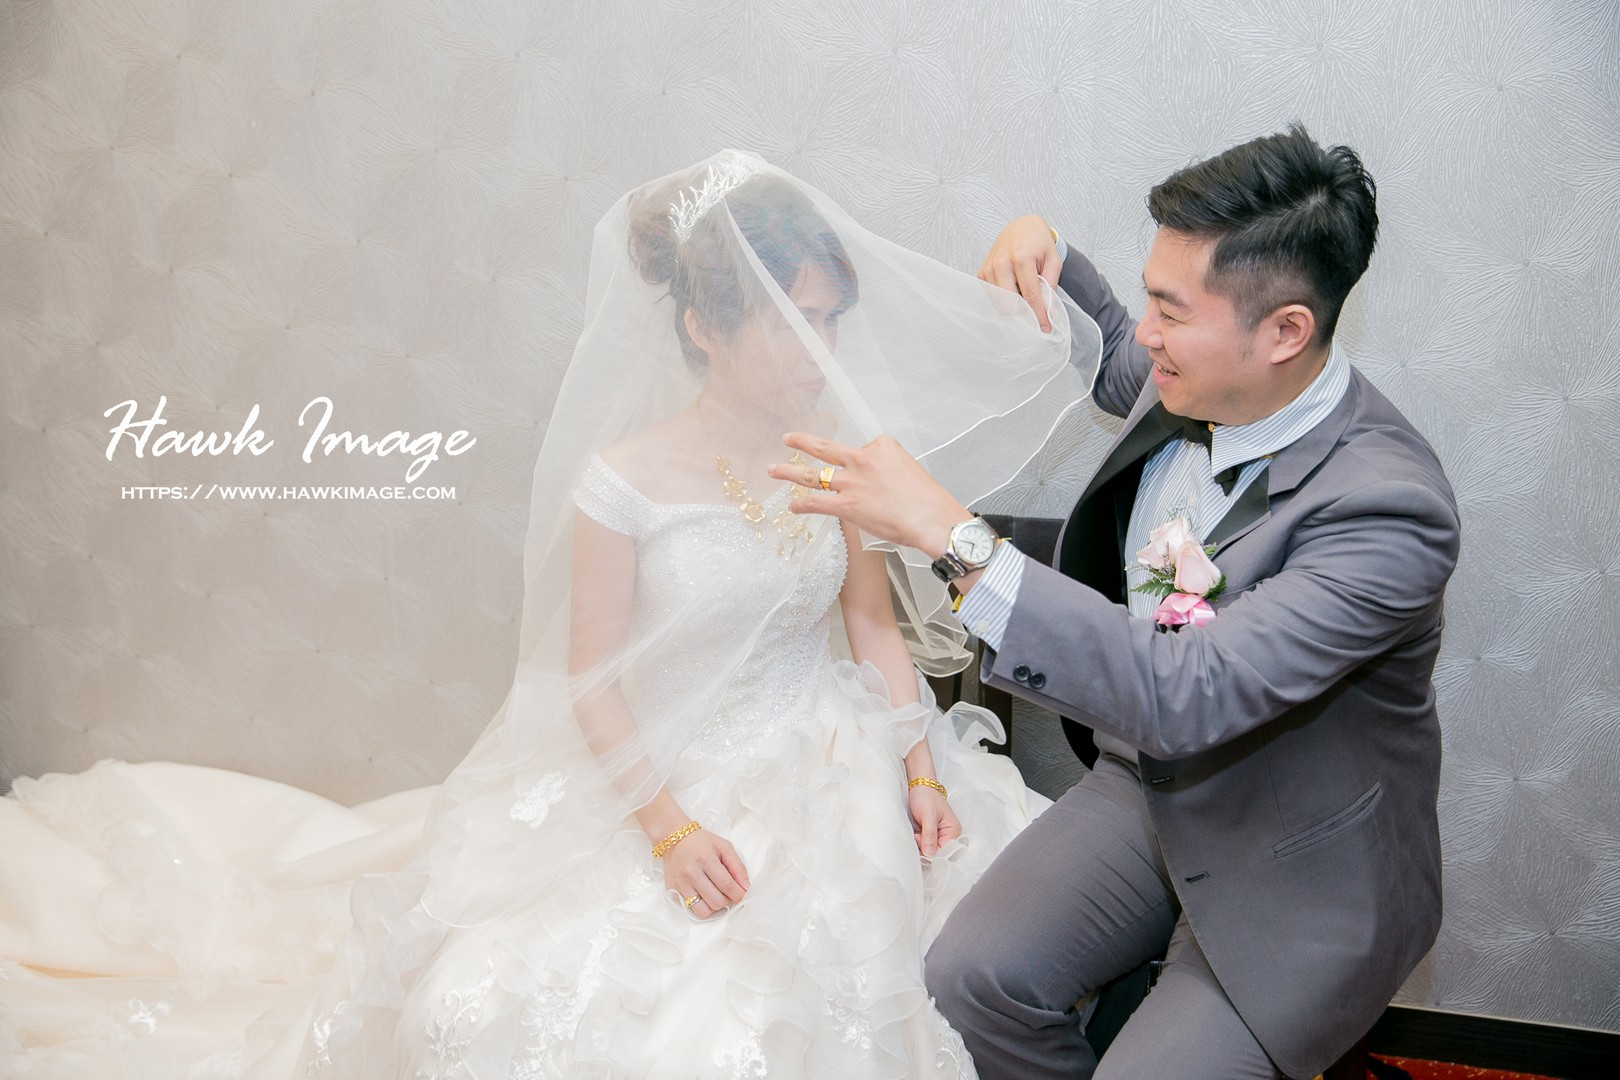 wedding-photo-婚禮攝影師:婚攝浩克